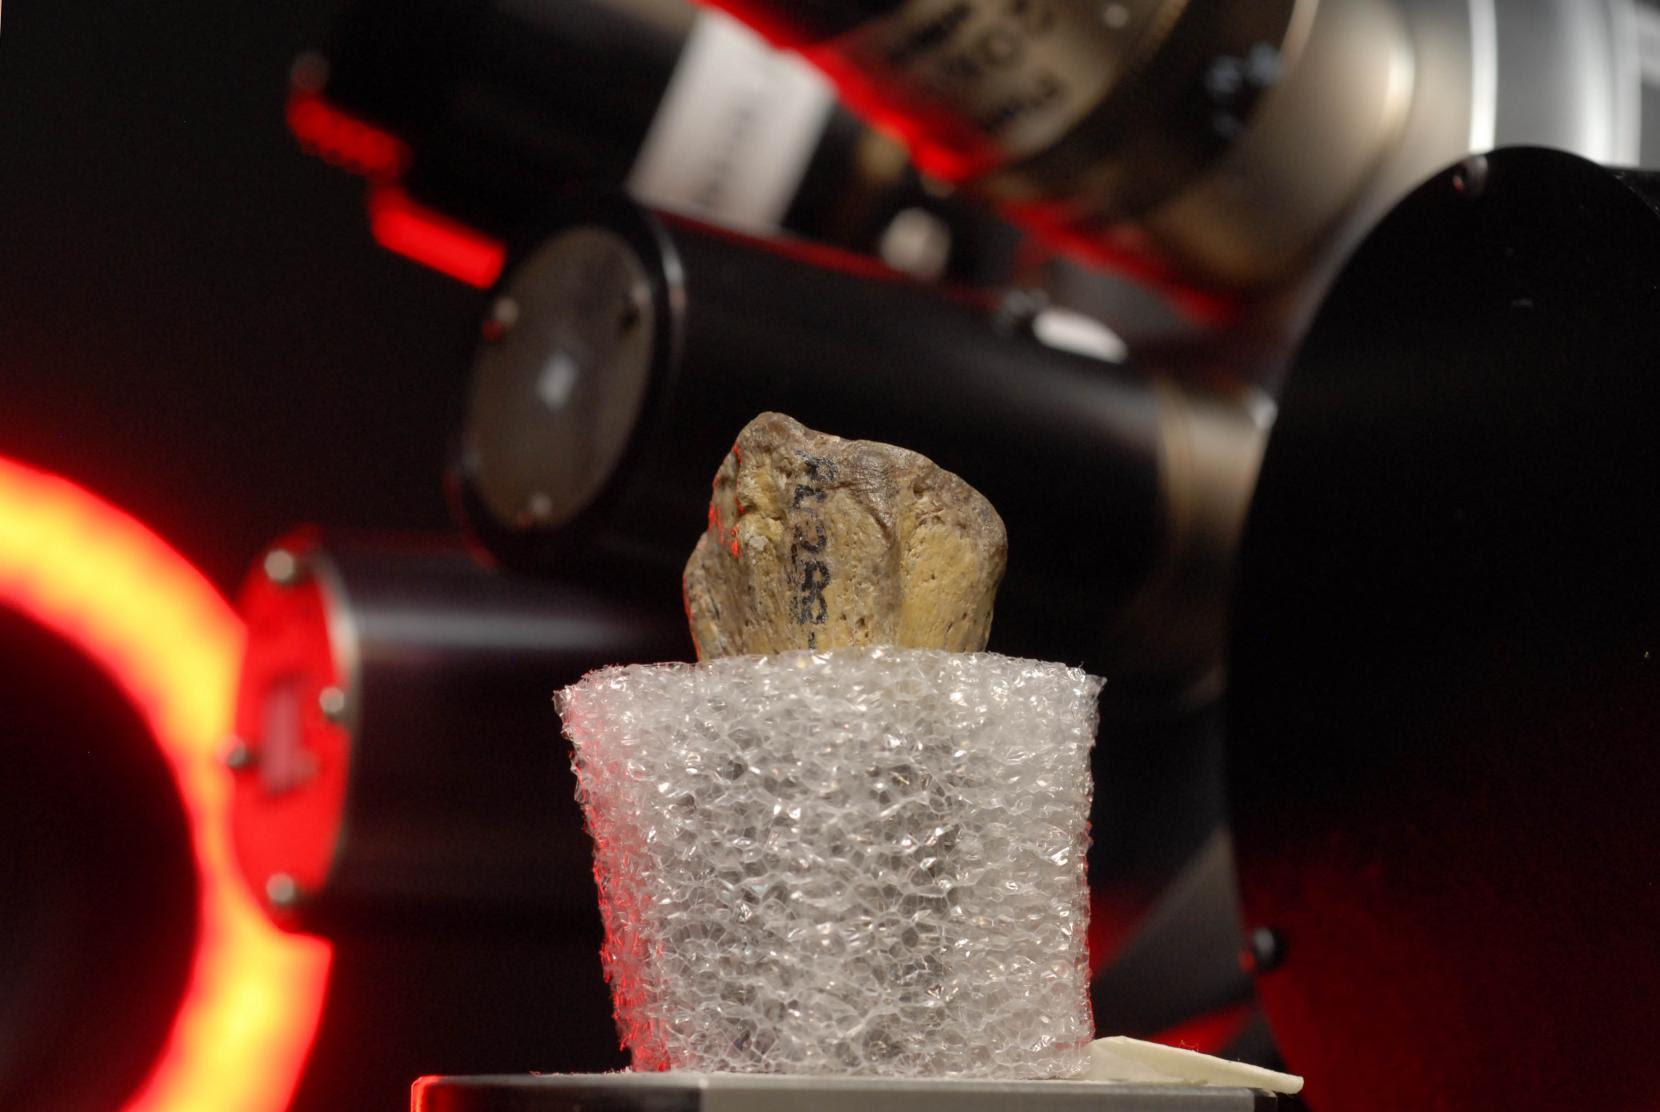 Australopithecus Afarensis: 'Lucy' Was A Tree Climber?